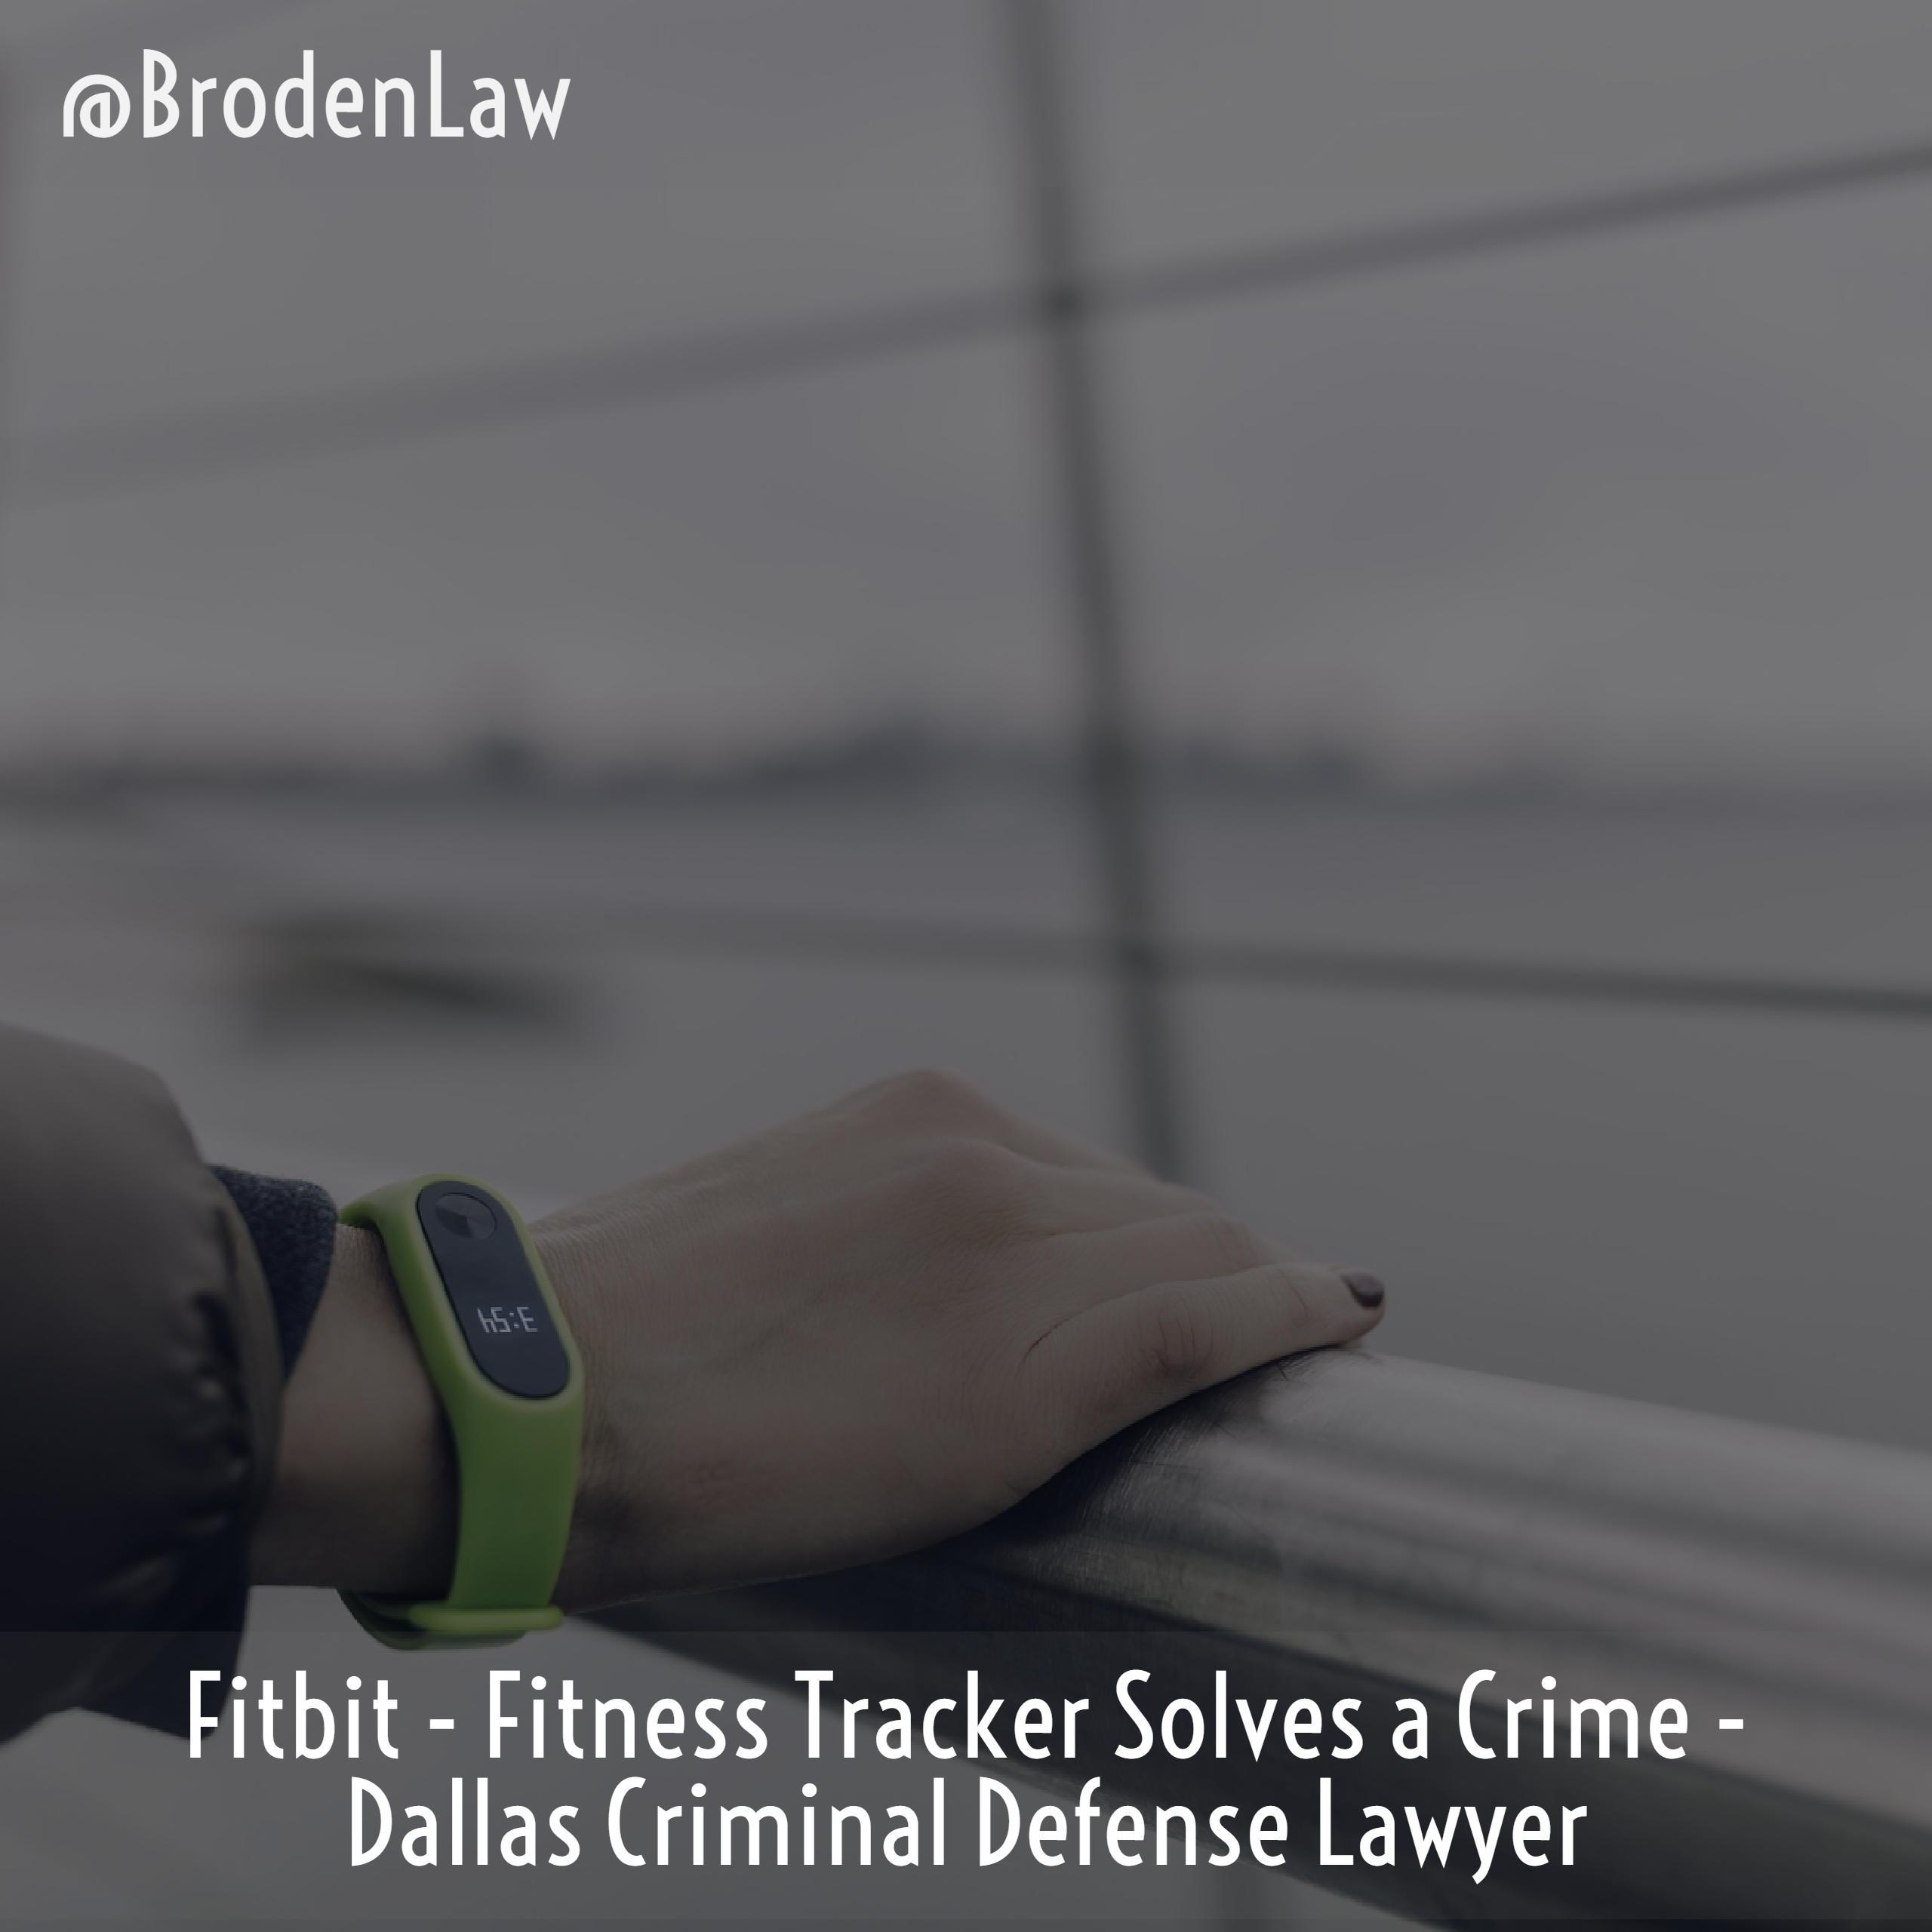 Fitbit - Fitness Tracker Solves a Crime - Dallas Criminal Defense Lawyer